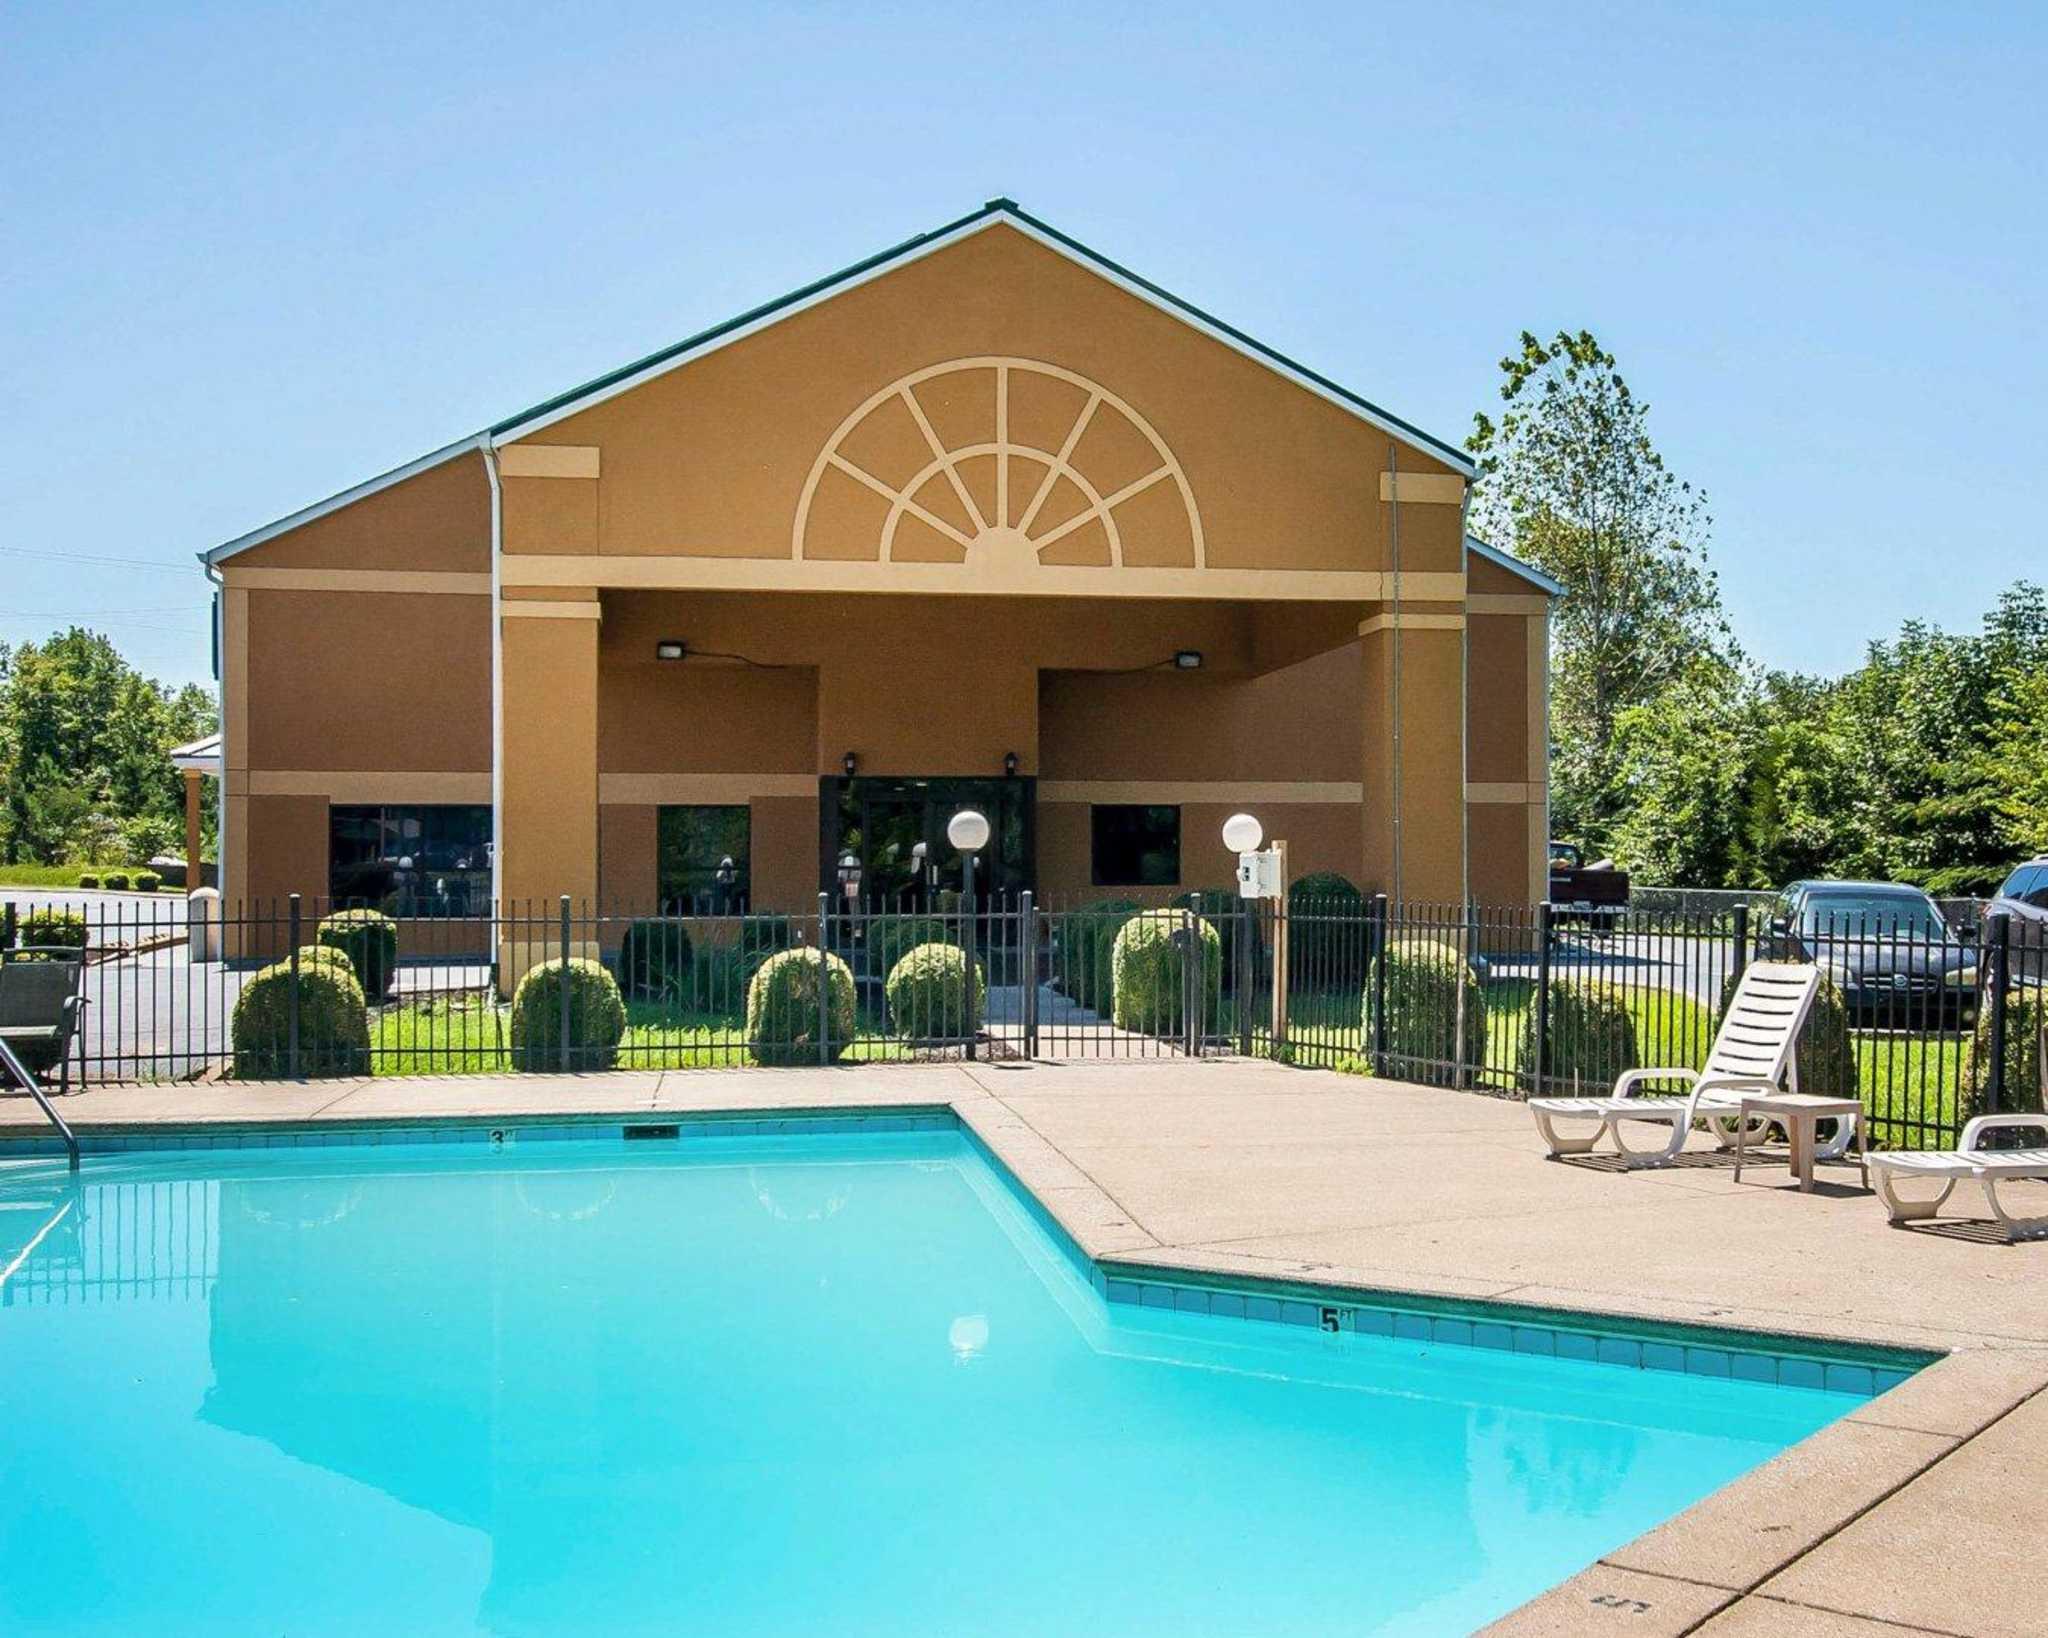 Jackson Real Estate - Jackson TN Homes For Sale | Zillow